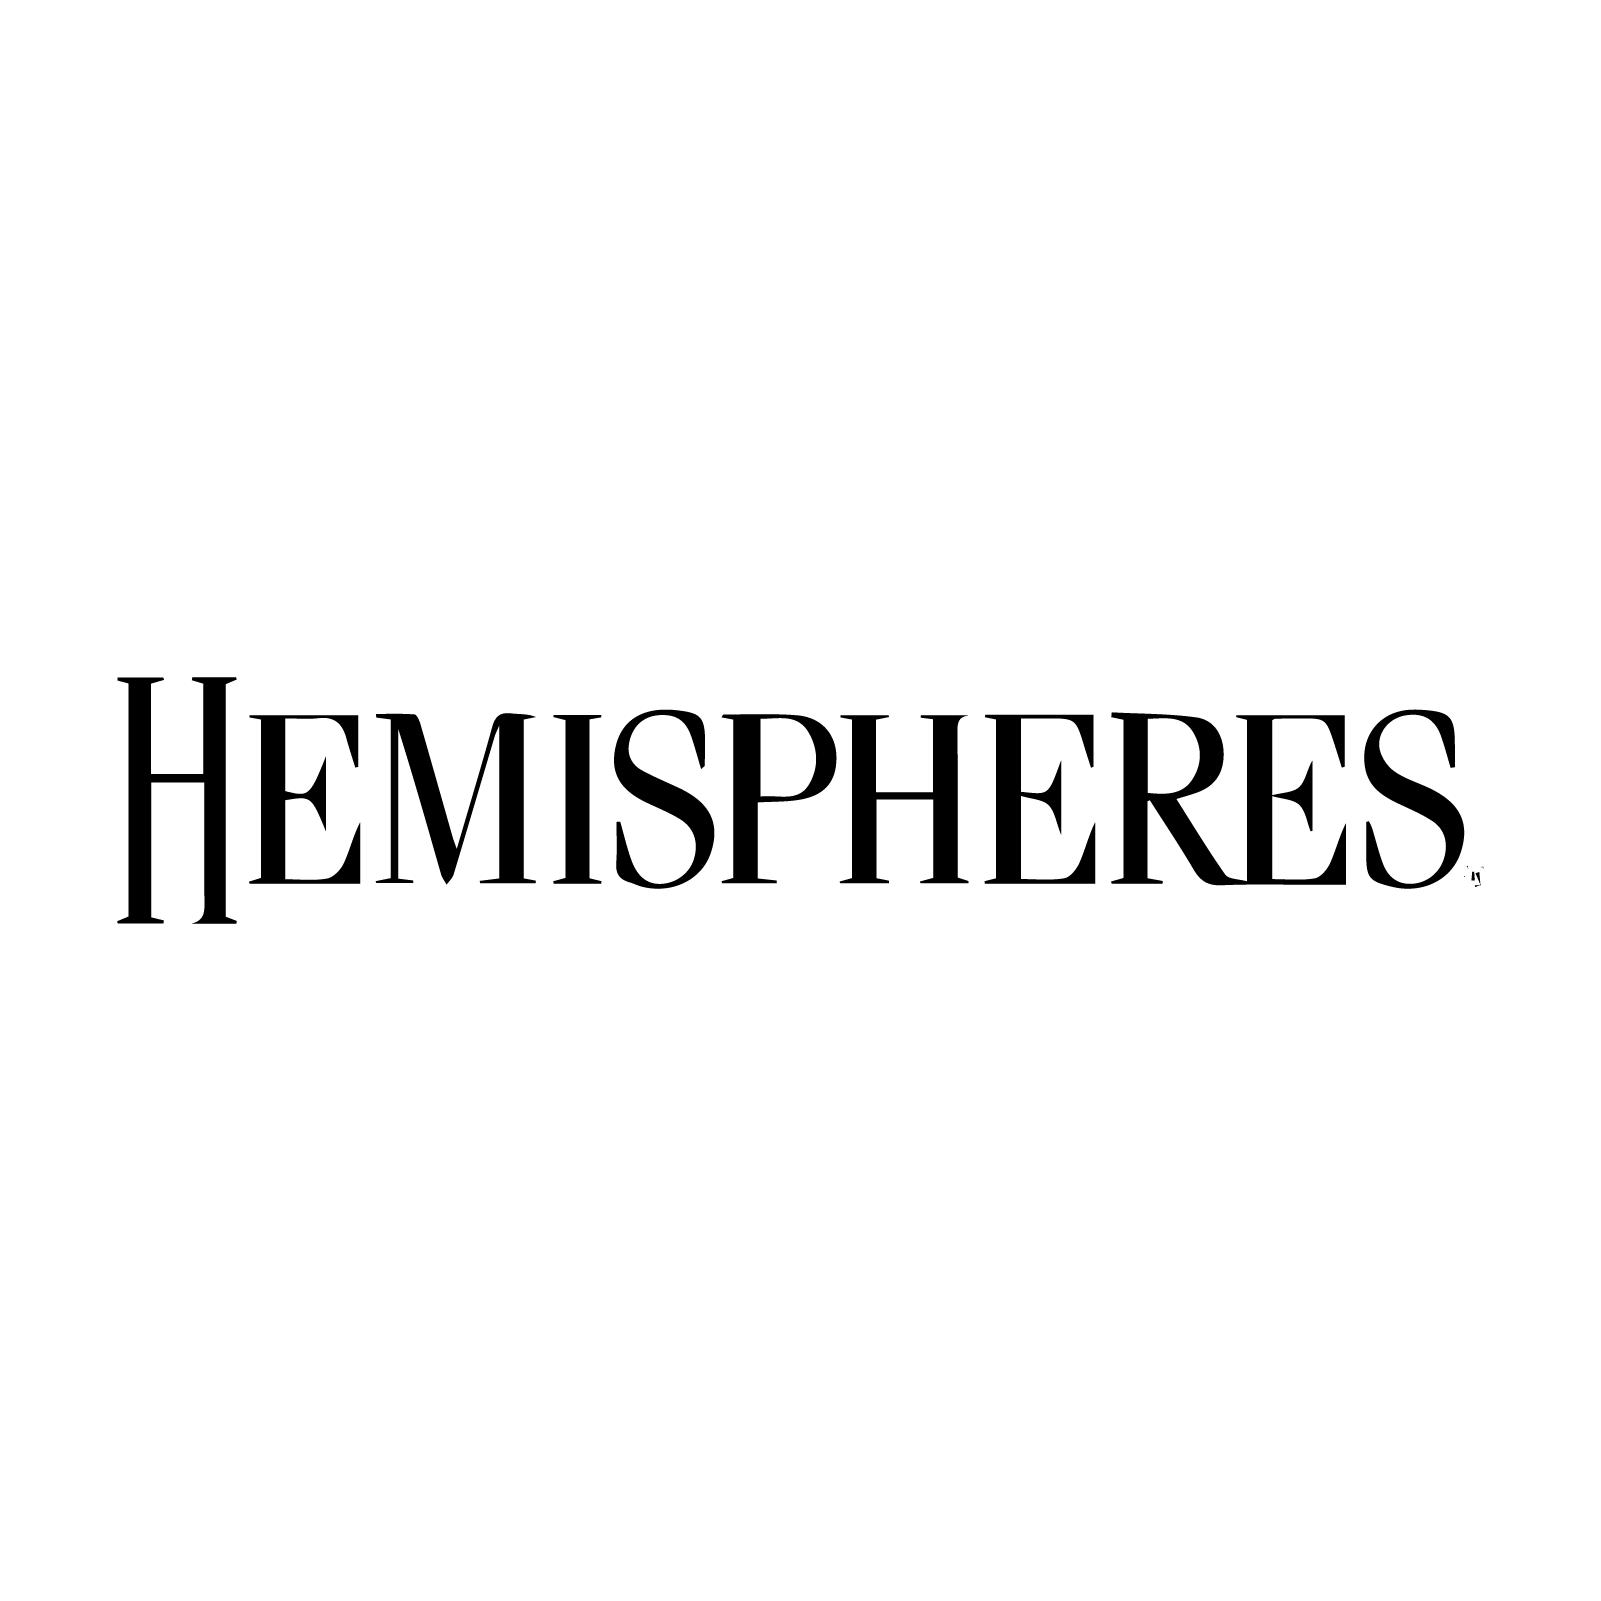 Press Logos_Hemispheres.png